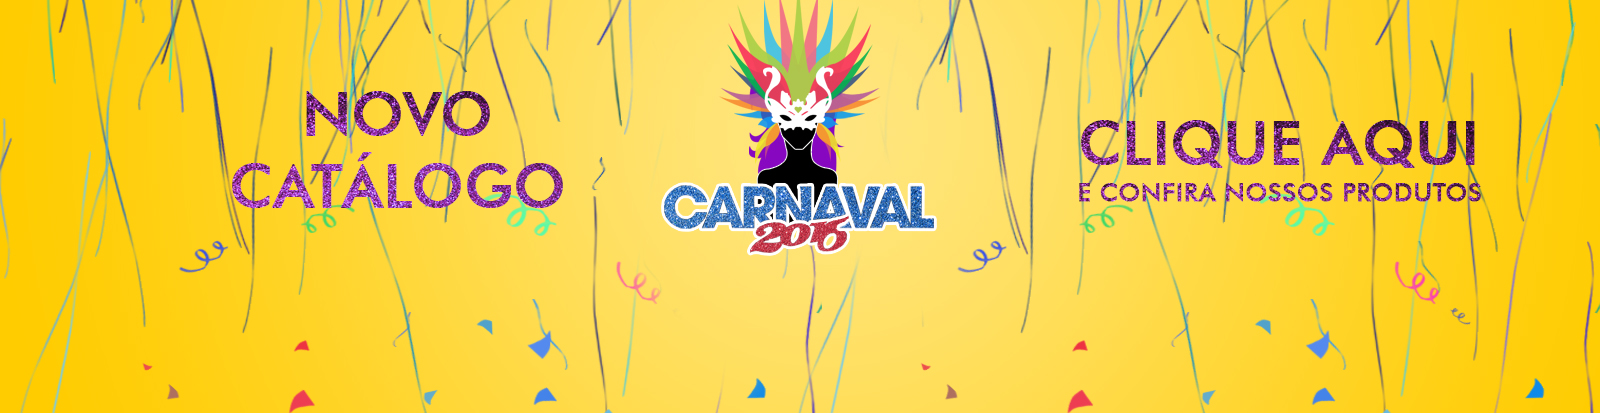 catalogo-carnaval2